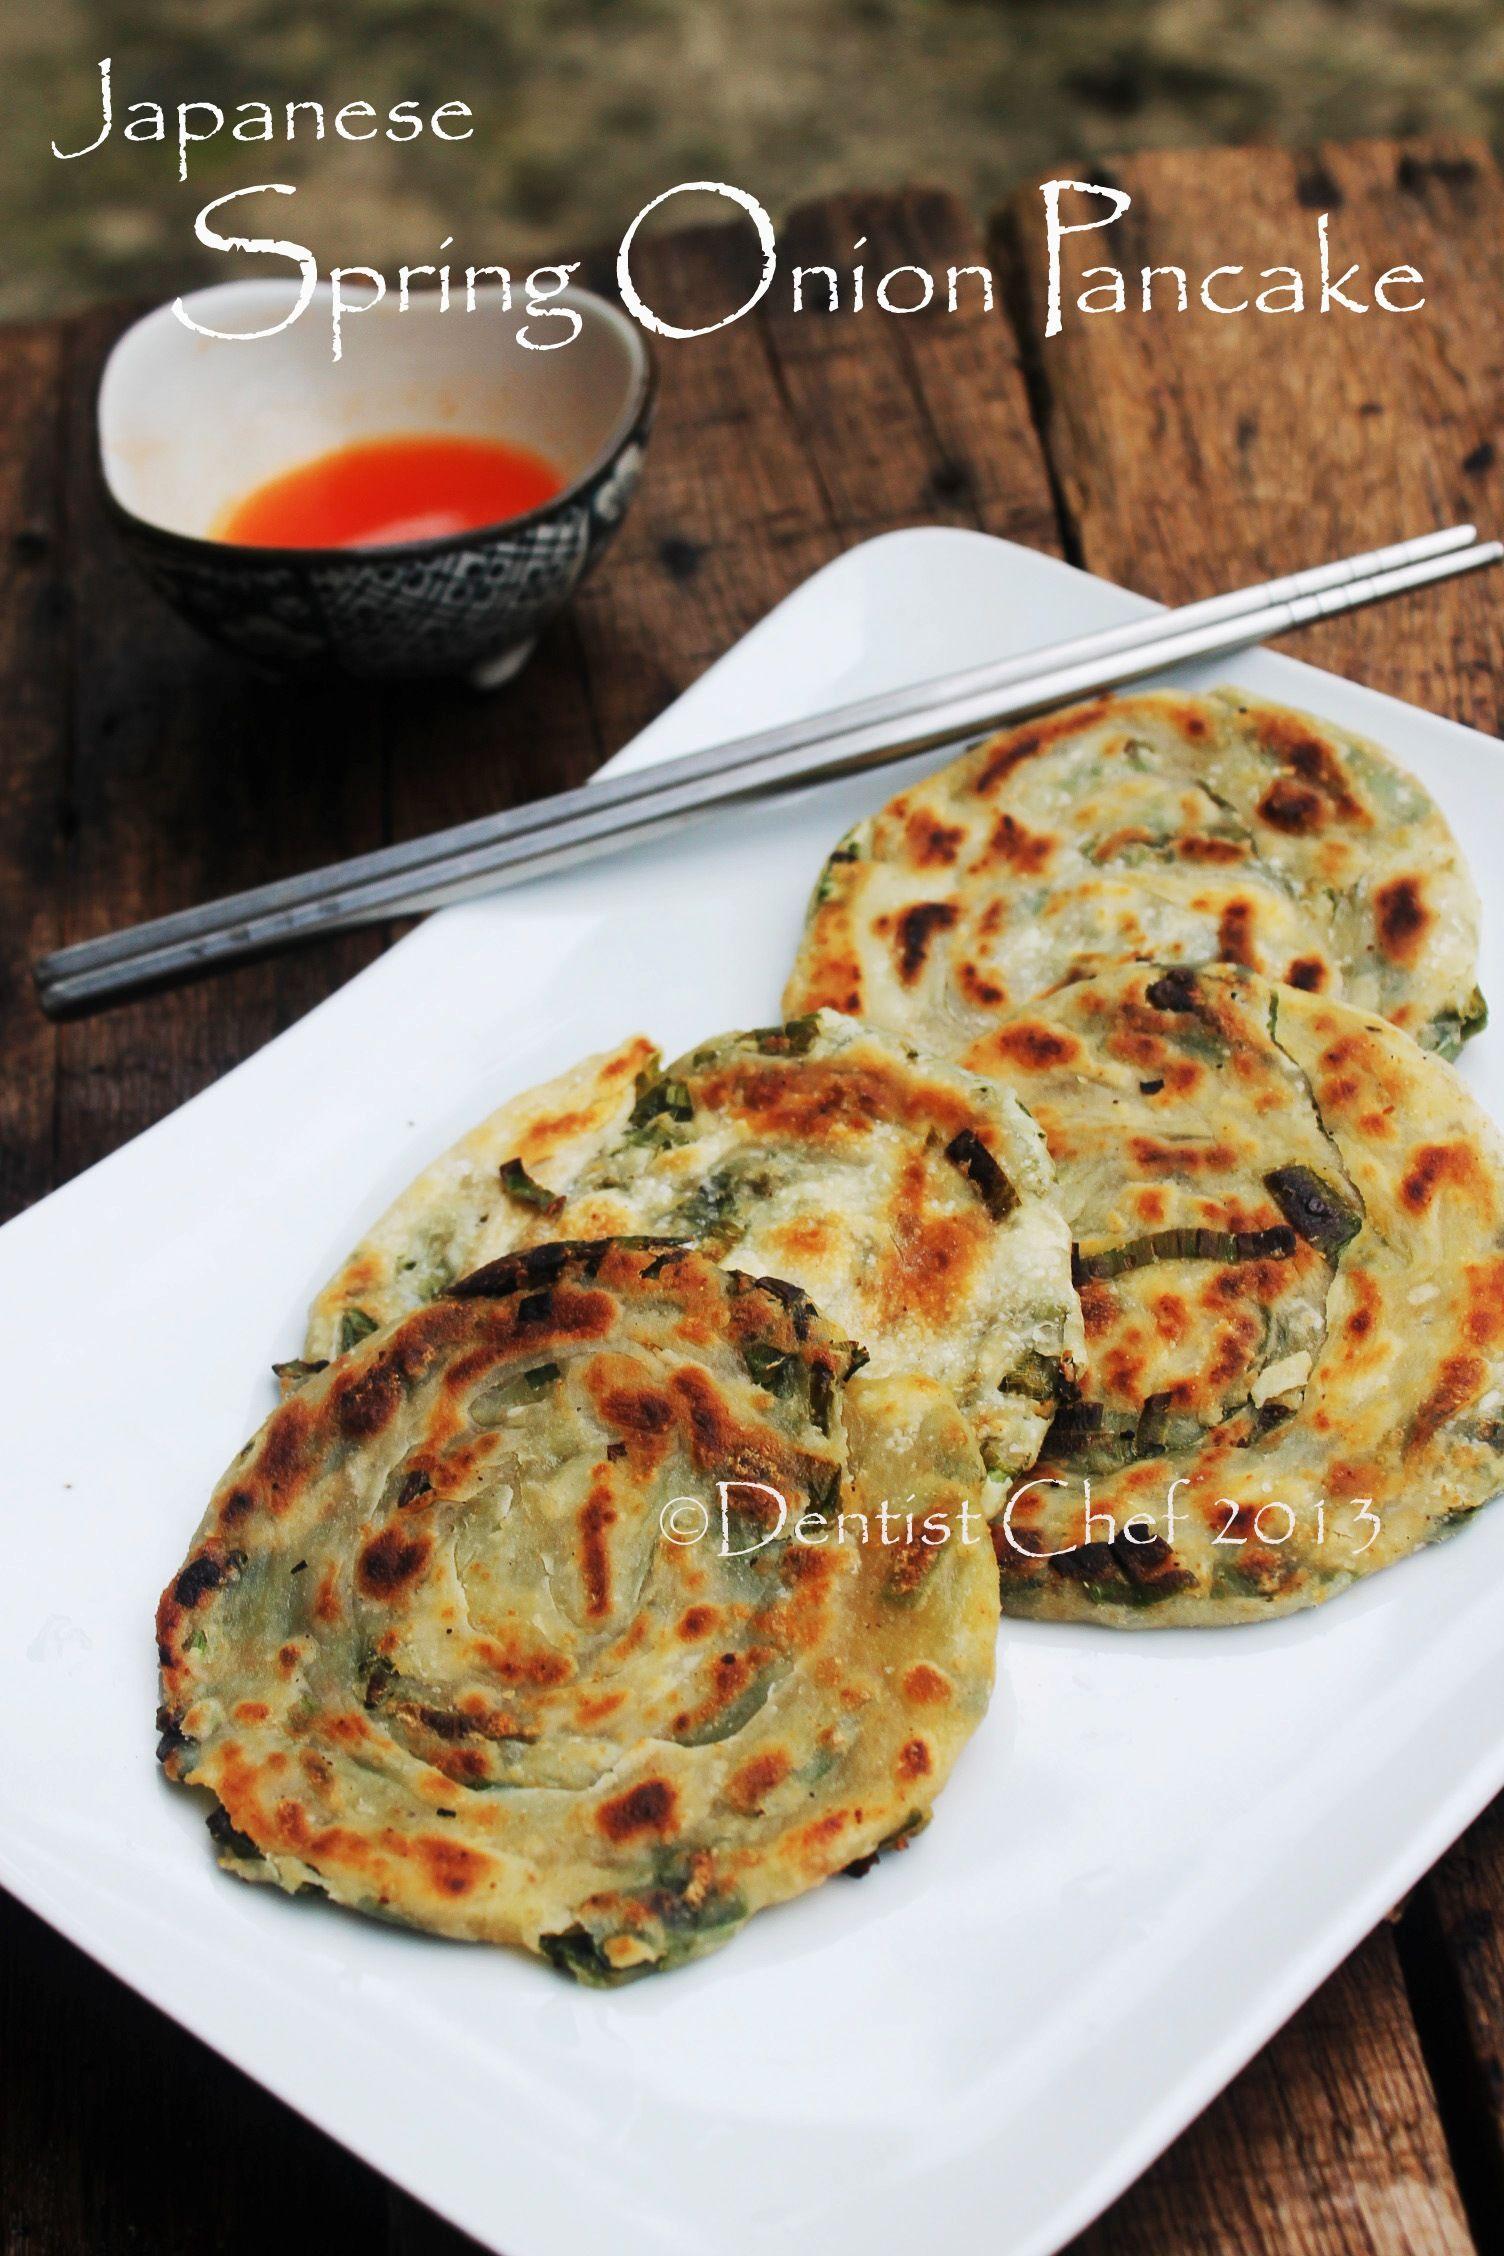 Japanese Spring Onion Scallion Leek Pancake Ala Dentist Chef Resep Makanan Dan Minuman Resep Makanan